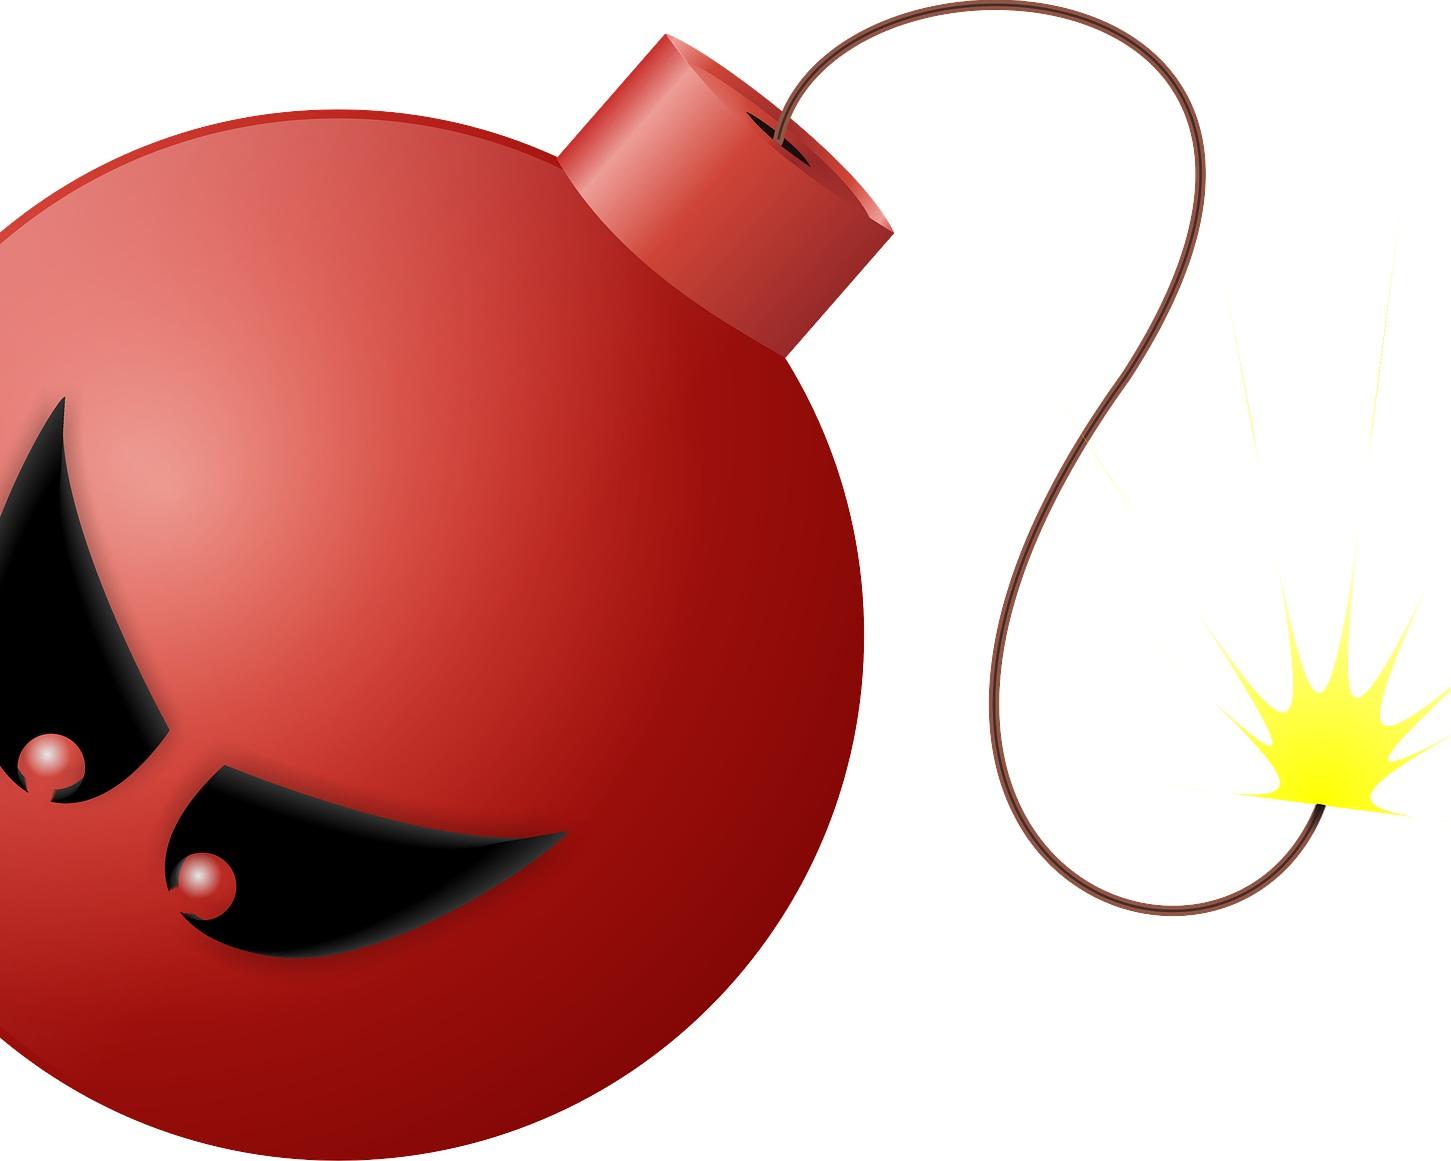 bomb-477229_1920.png